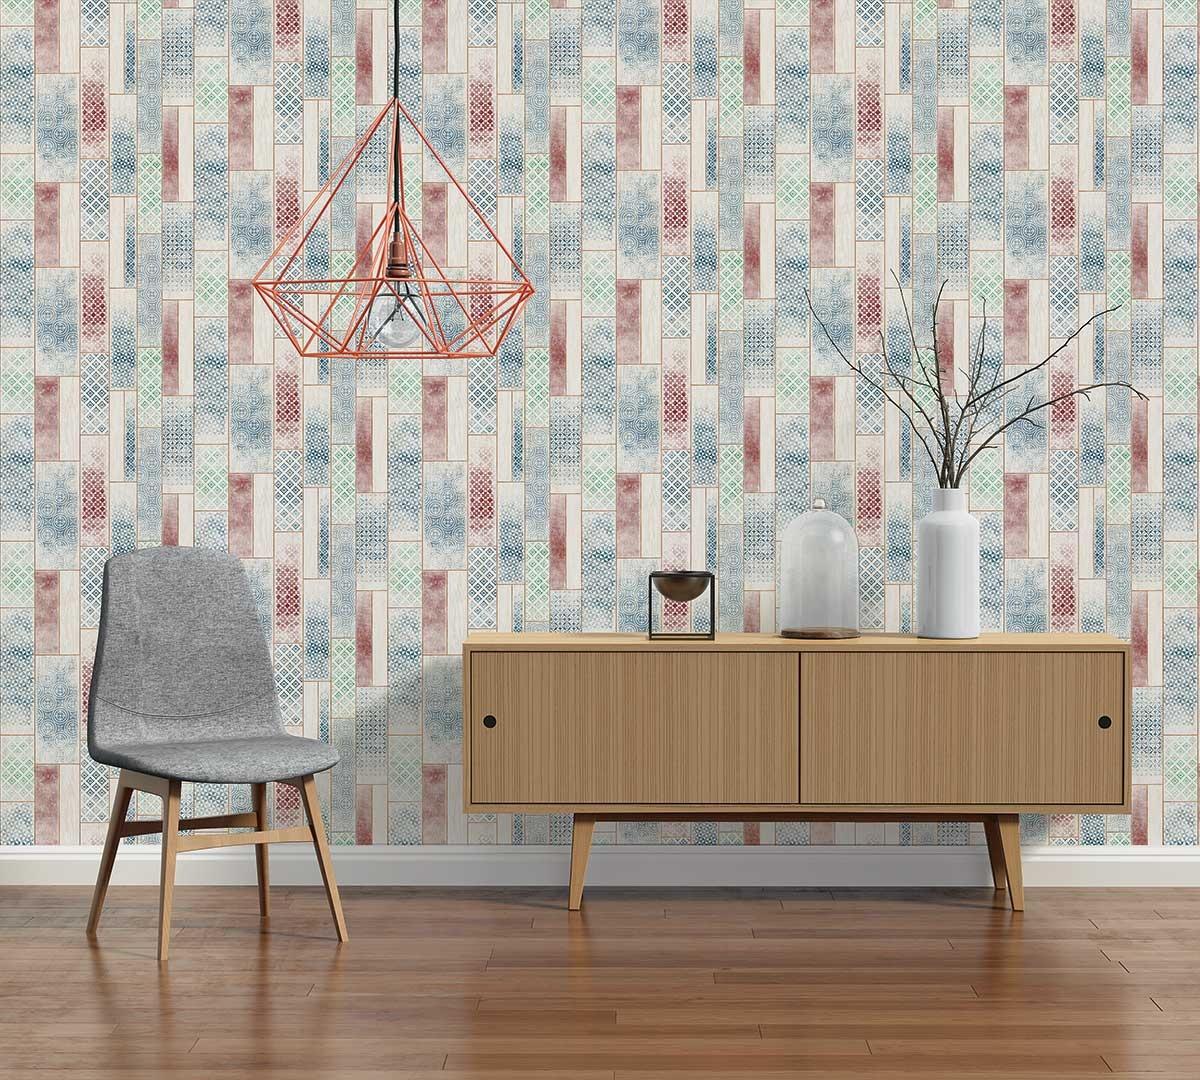 papier peint imitation lambris motifs azuleros bleu. Black Bedroom Furniture Sets. Home Design Ideas